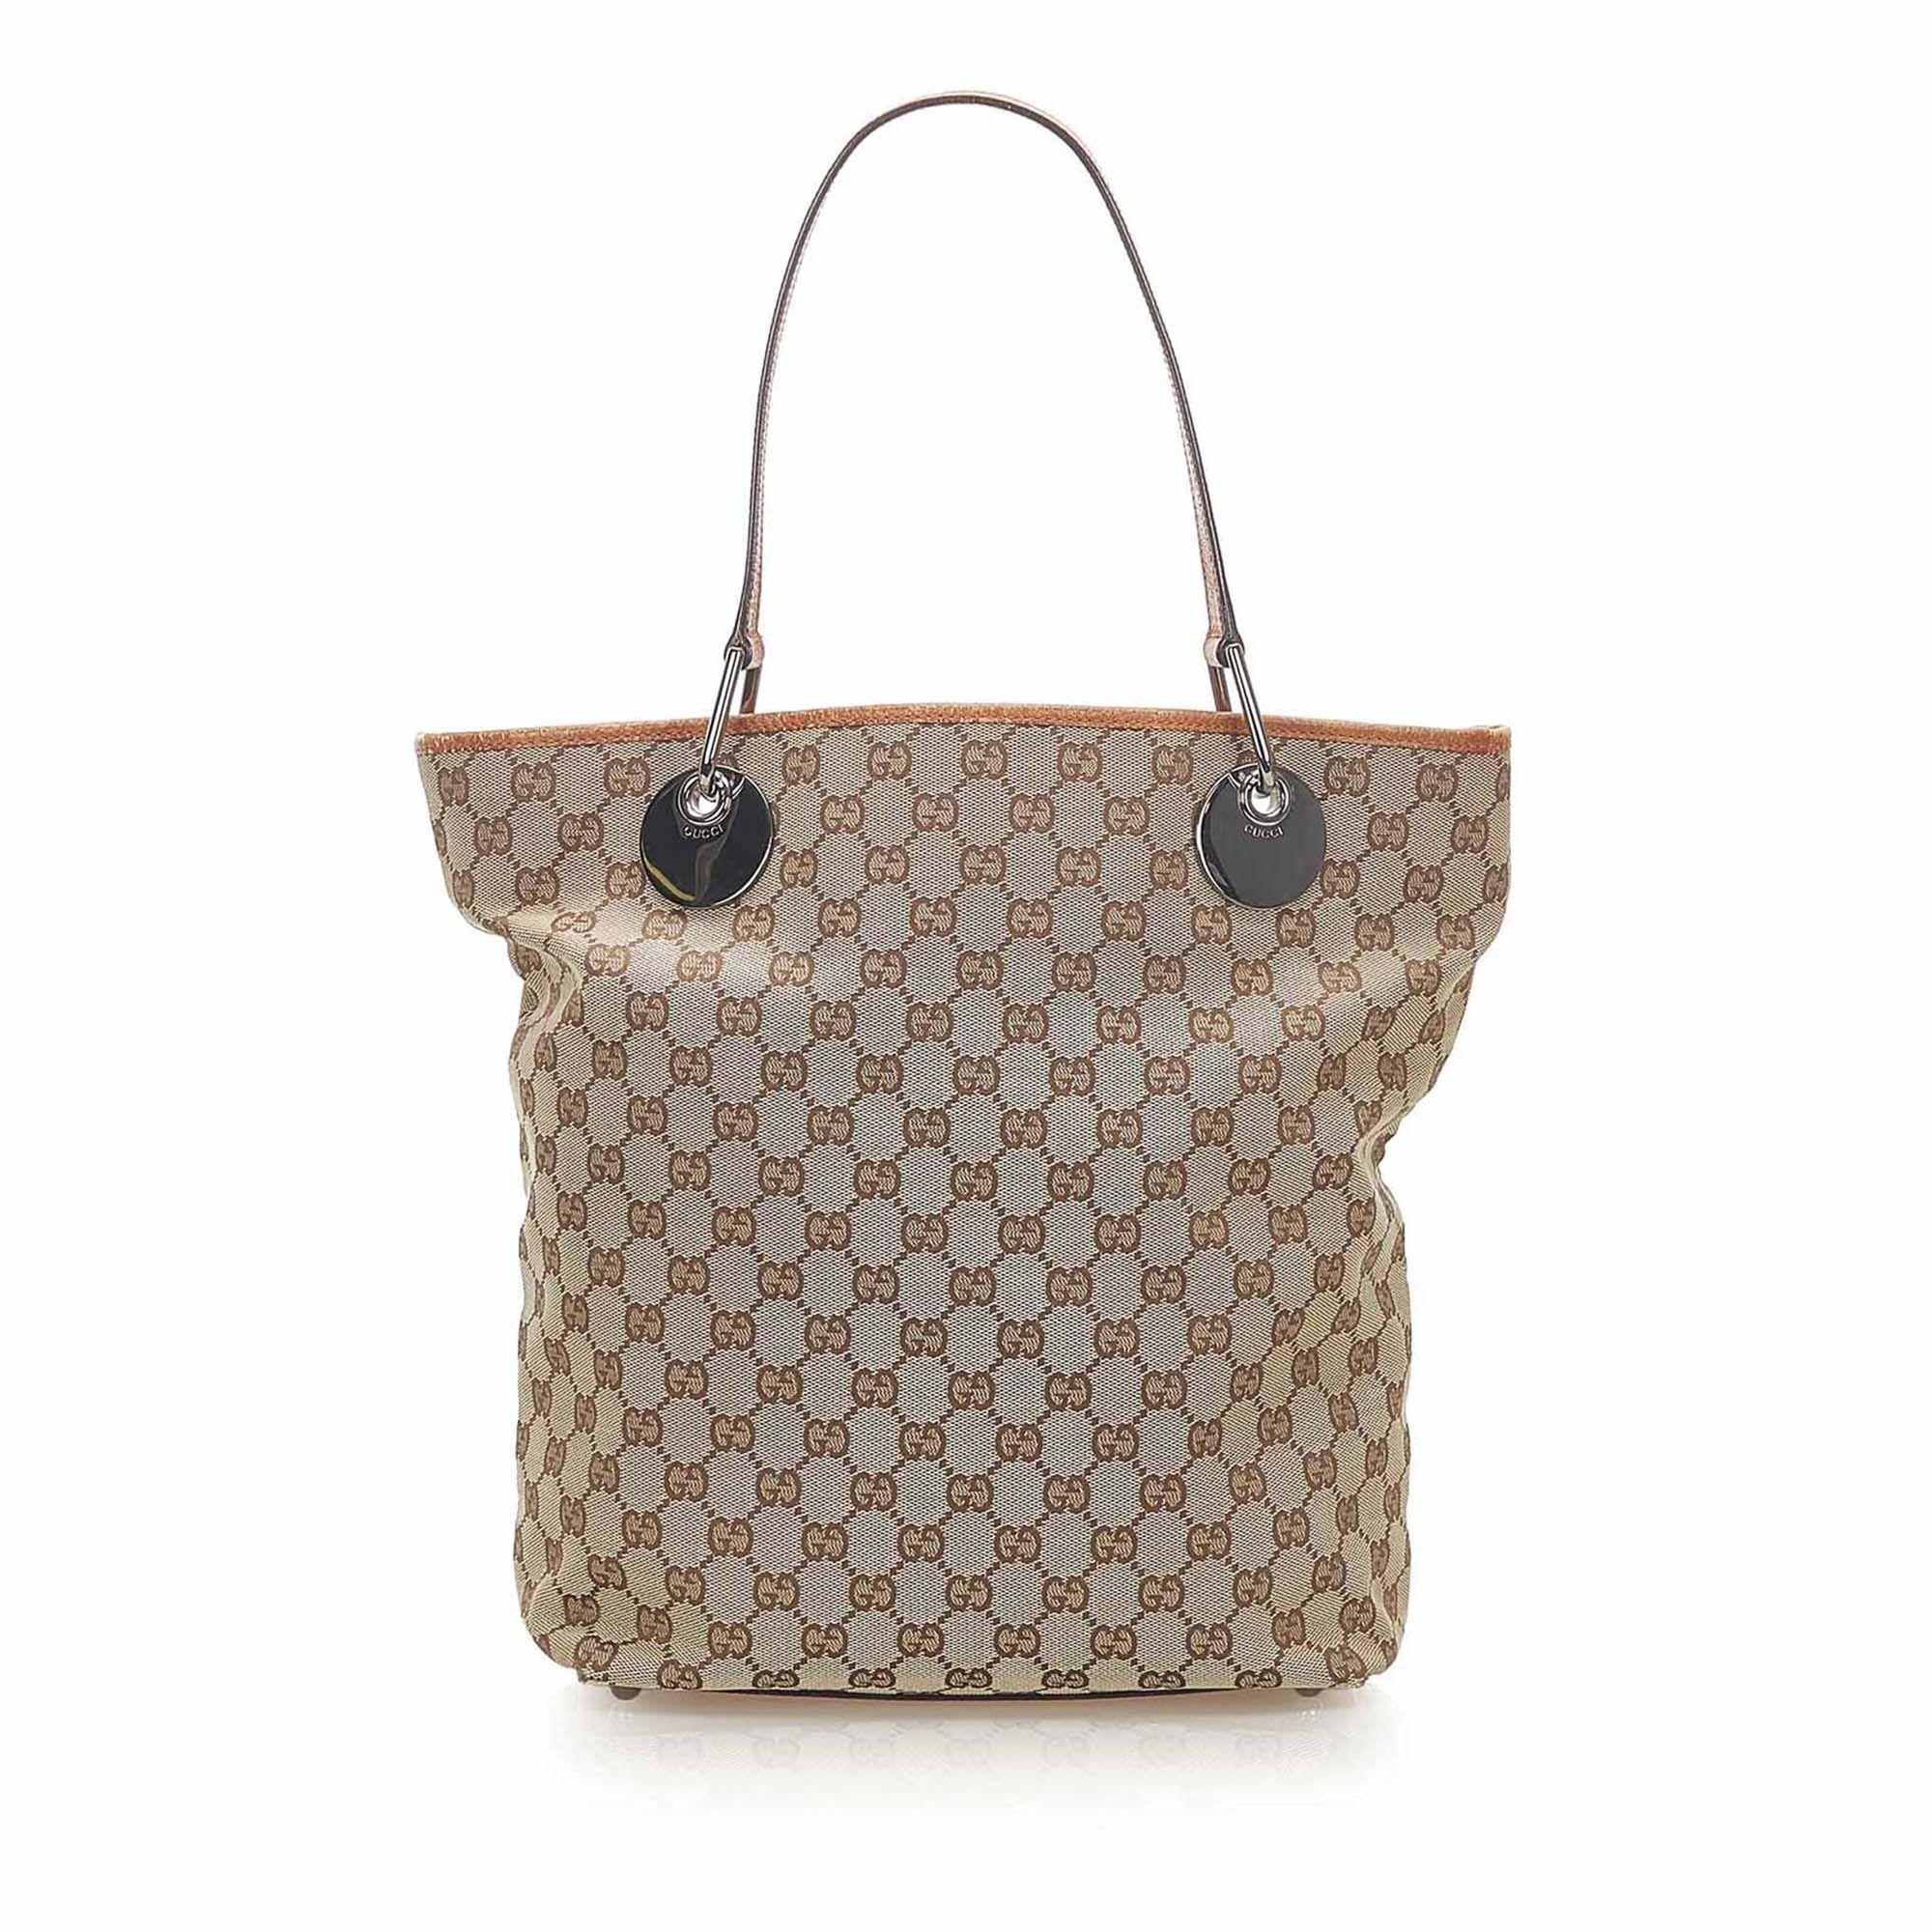 Vintage Gucci GG Canvas Eclipse Tote Bag Brown